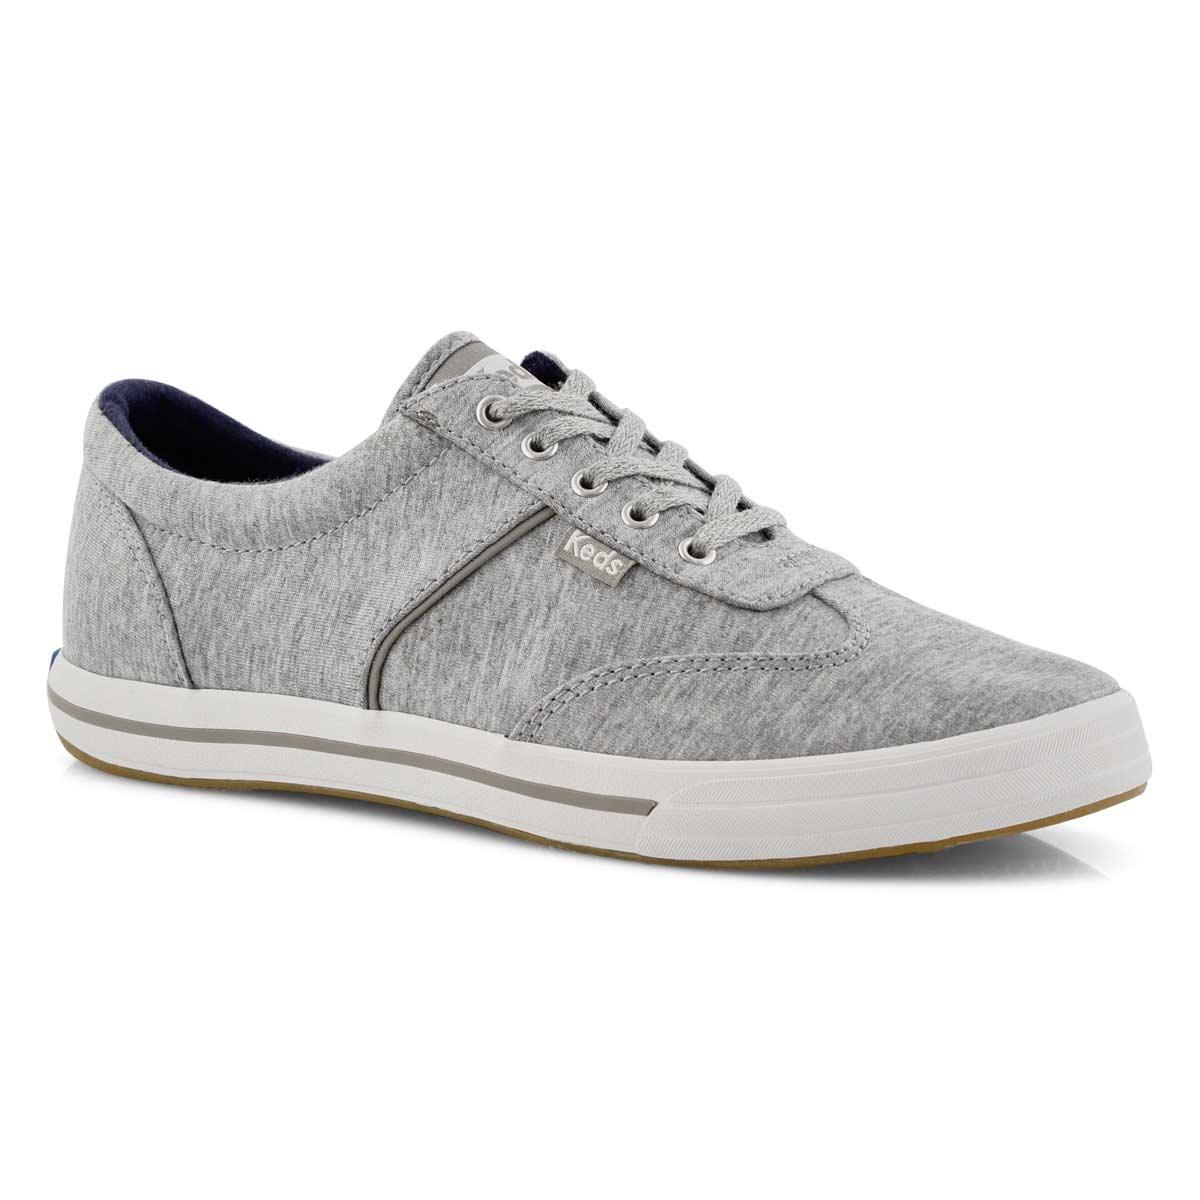 79a2a8f9f7ce Keds Women's COURTY JERSEY light grey sneaker | Softmoc.com